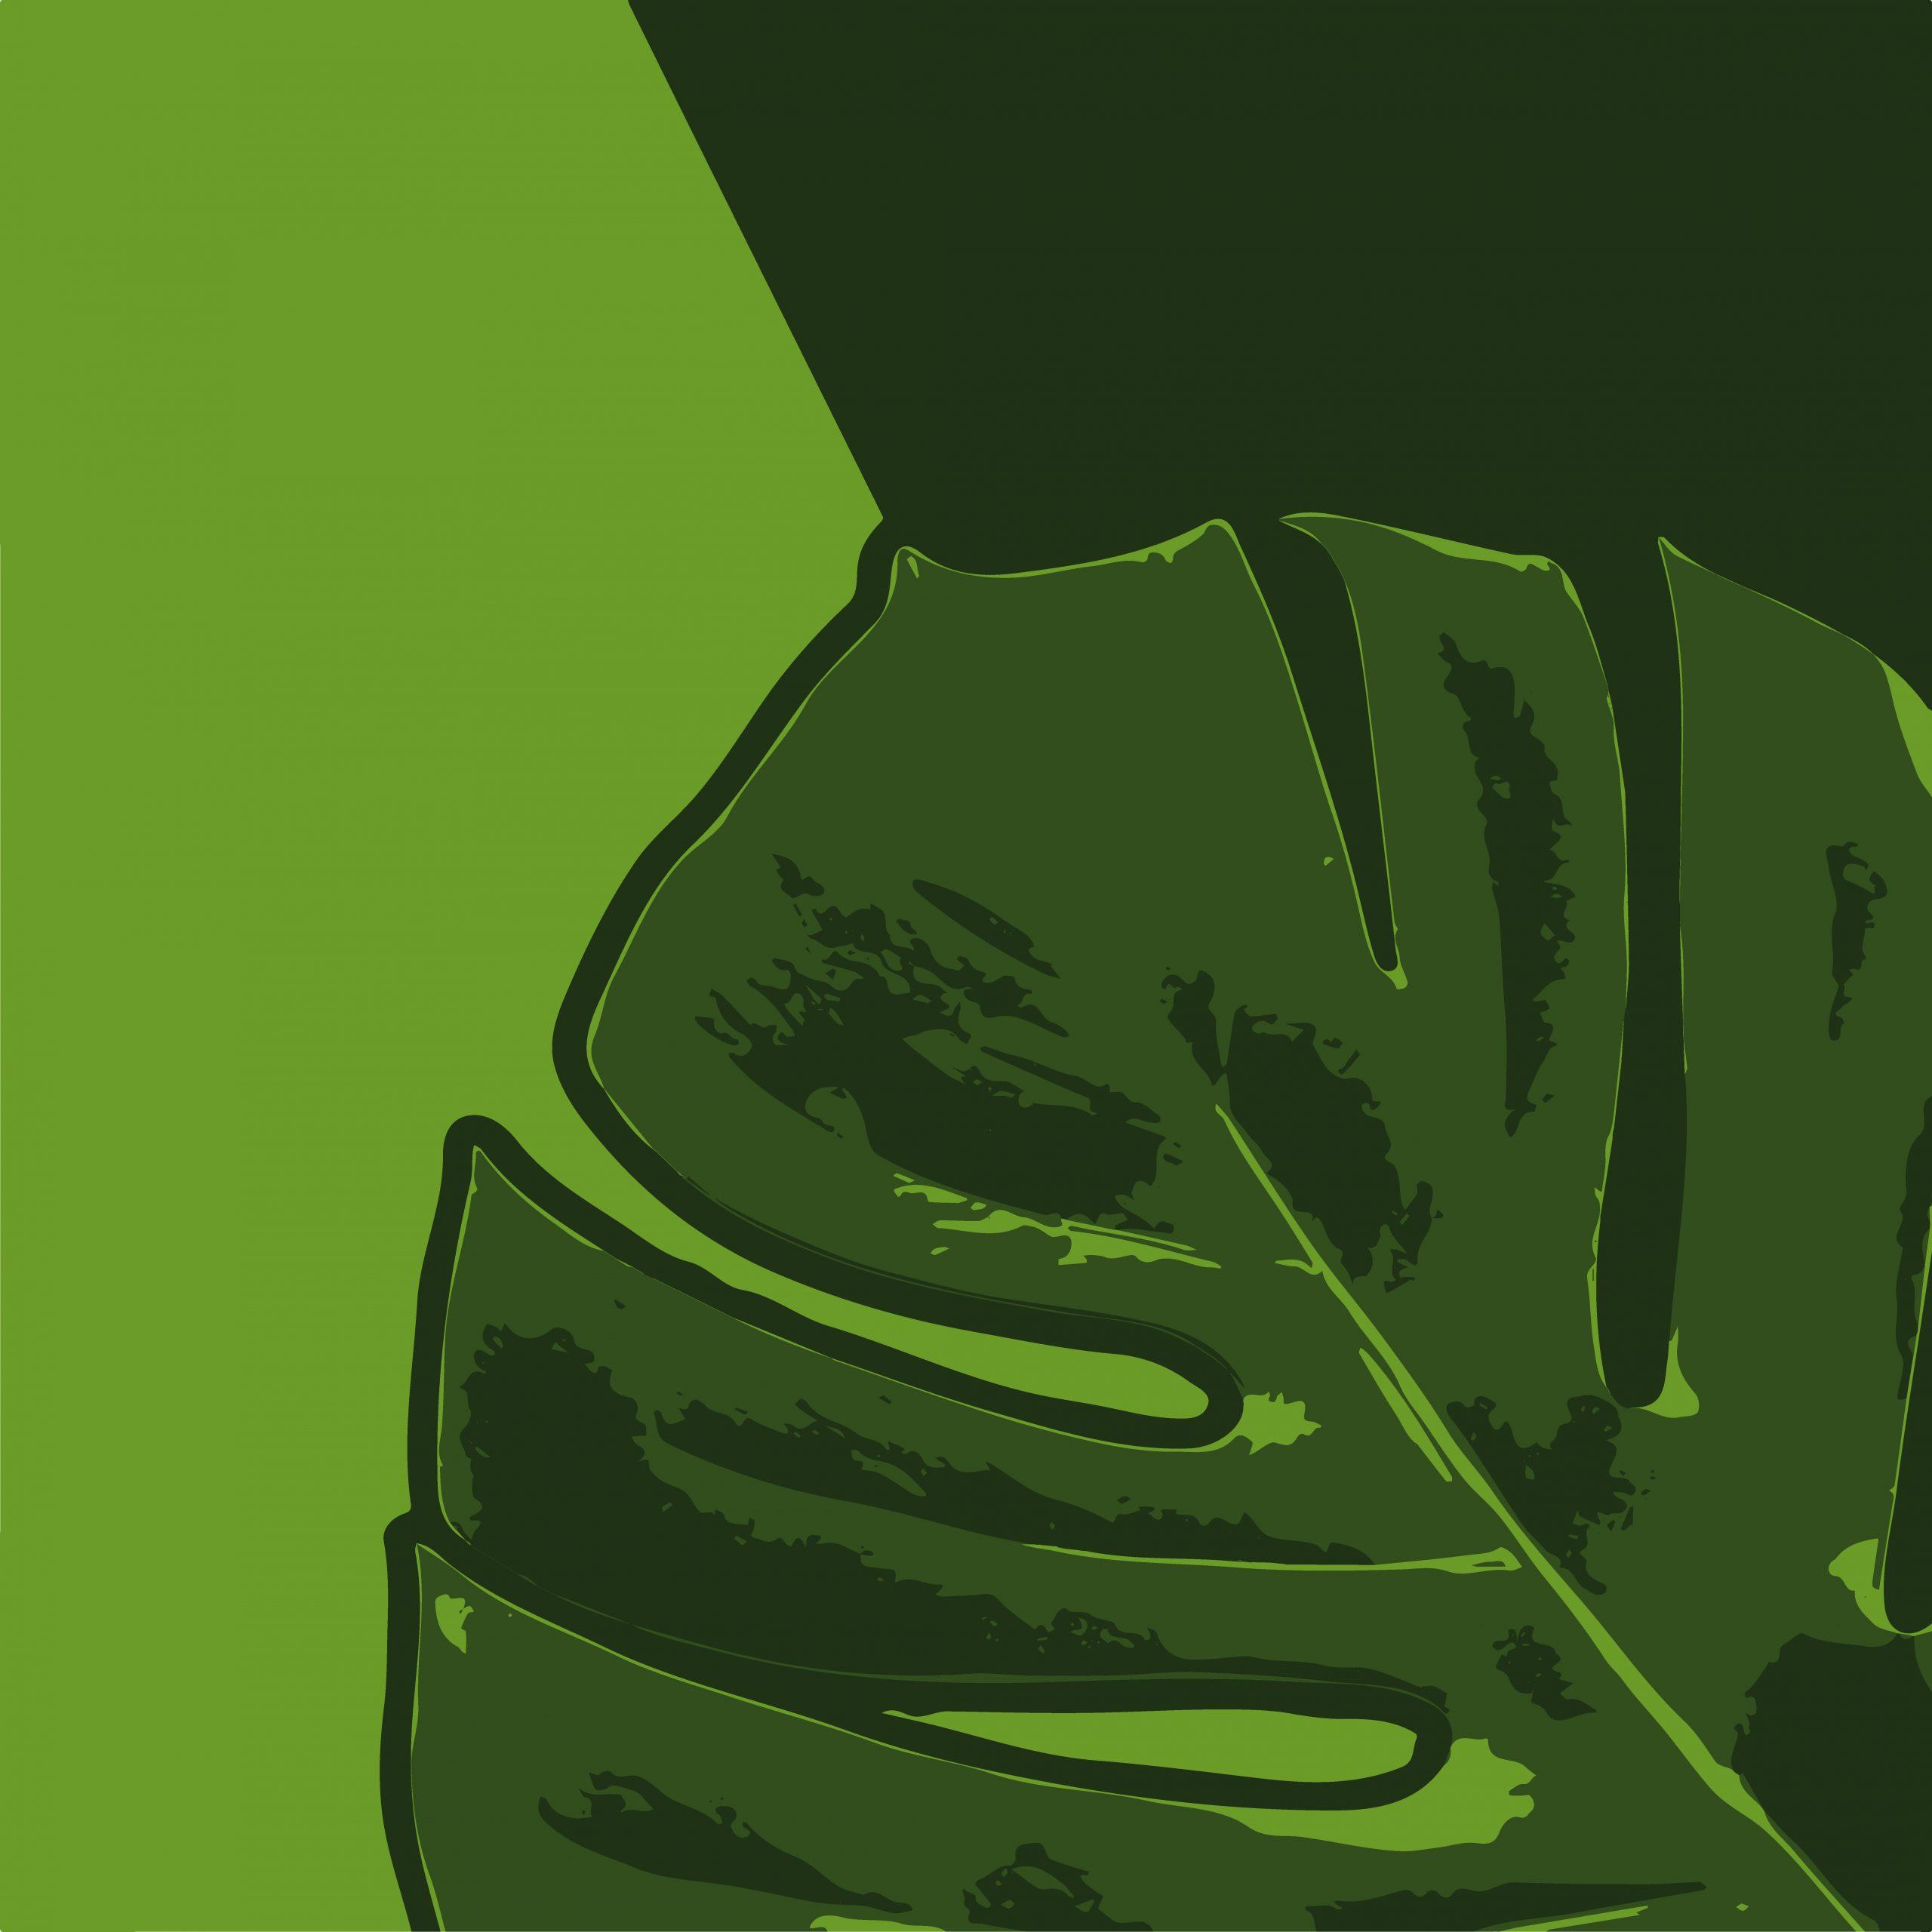 Green leaf of a plant